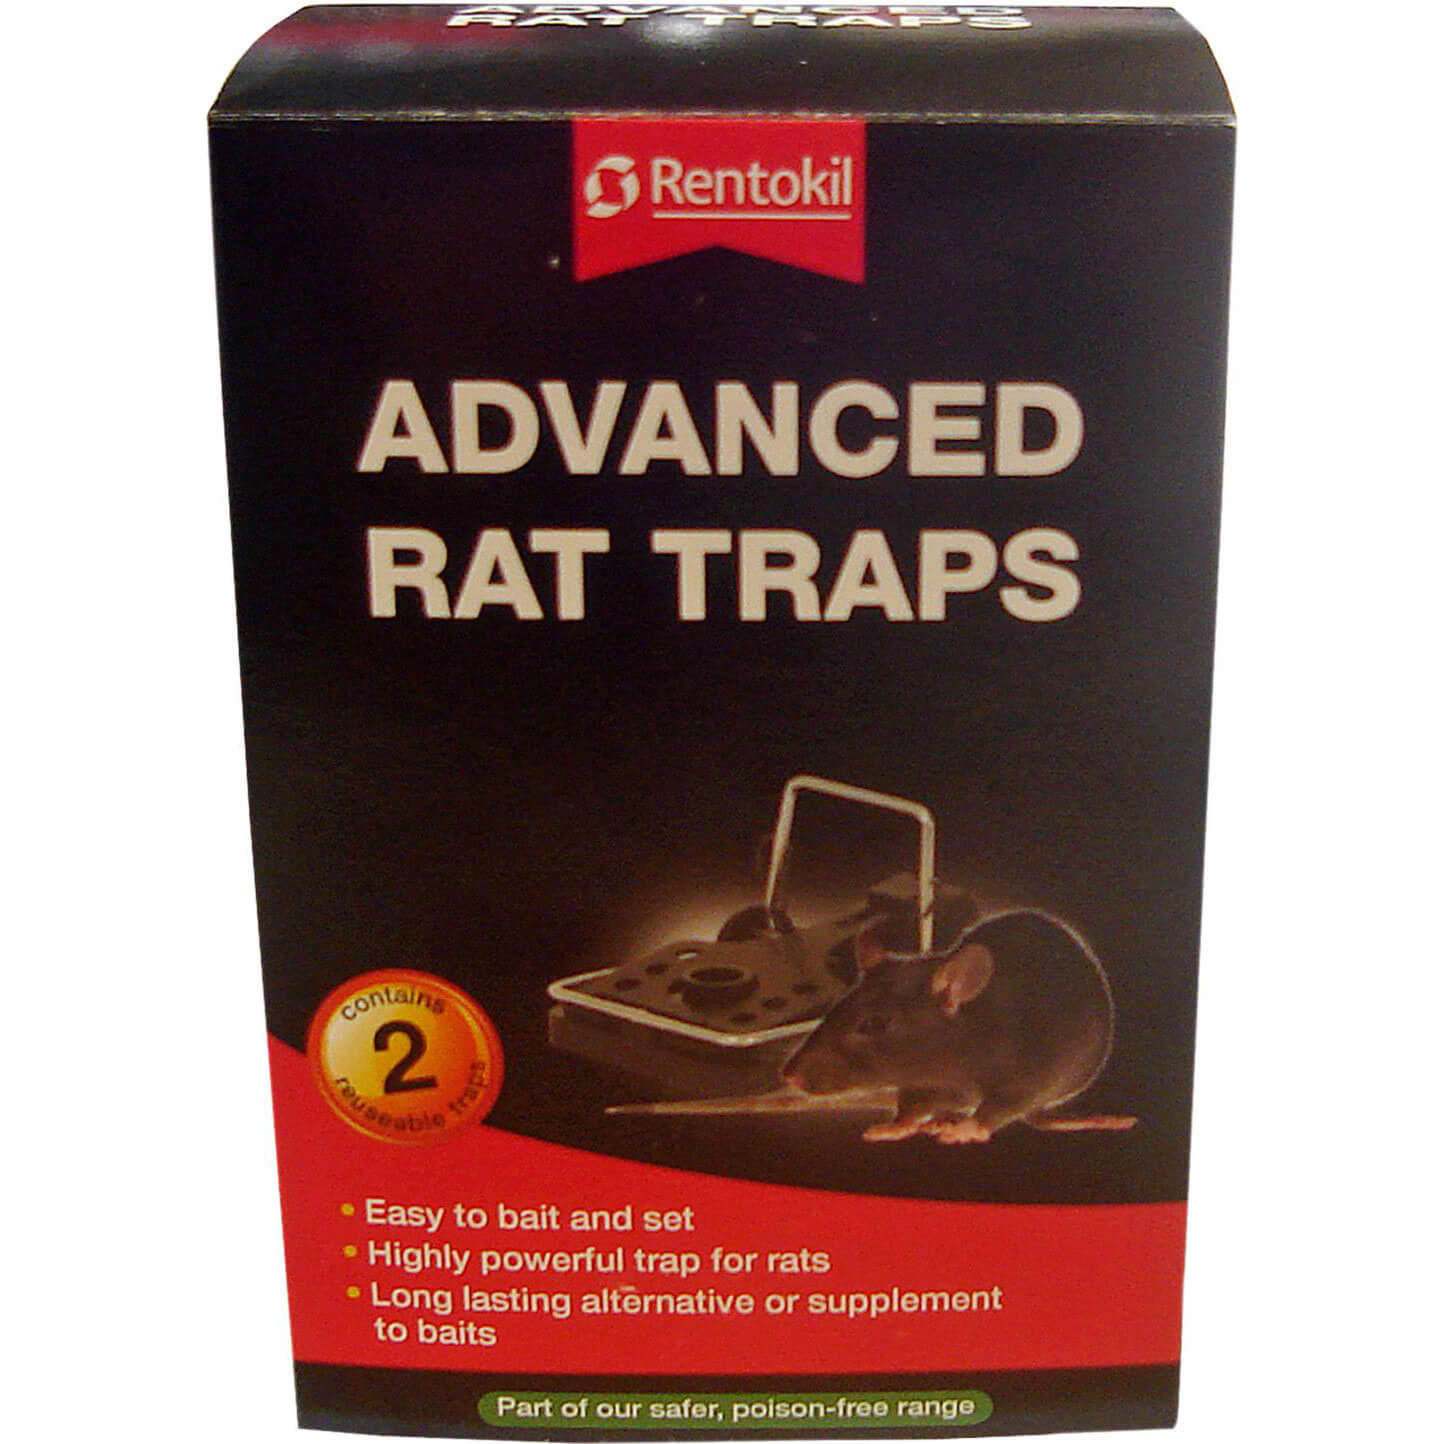 Image of Rentokil Advanced Rat Traps Pack of 2